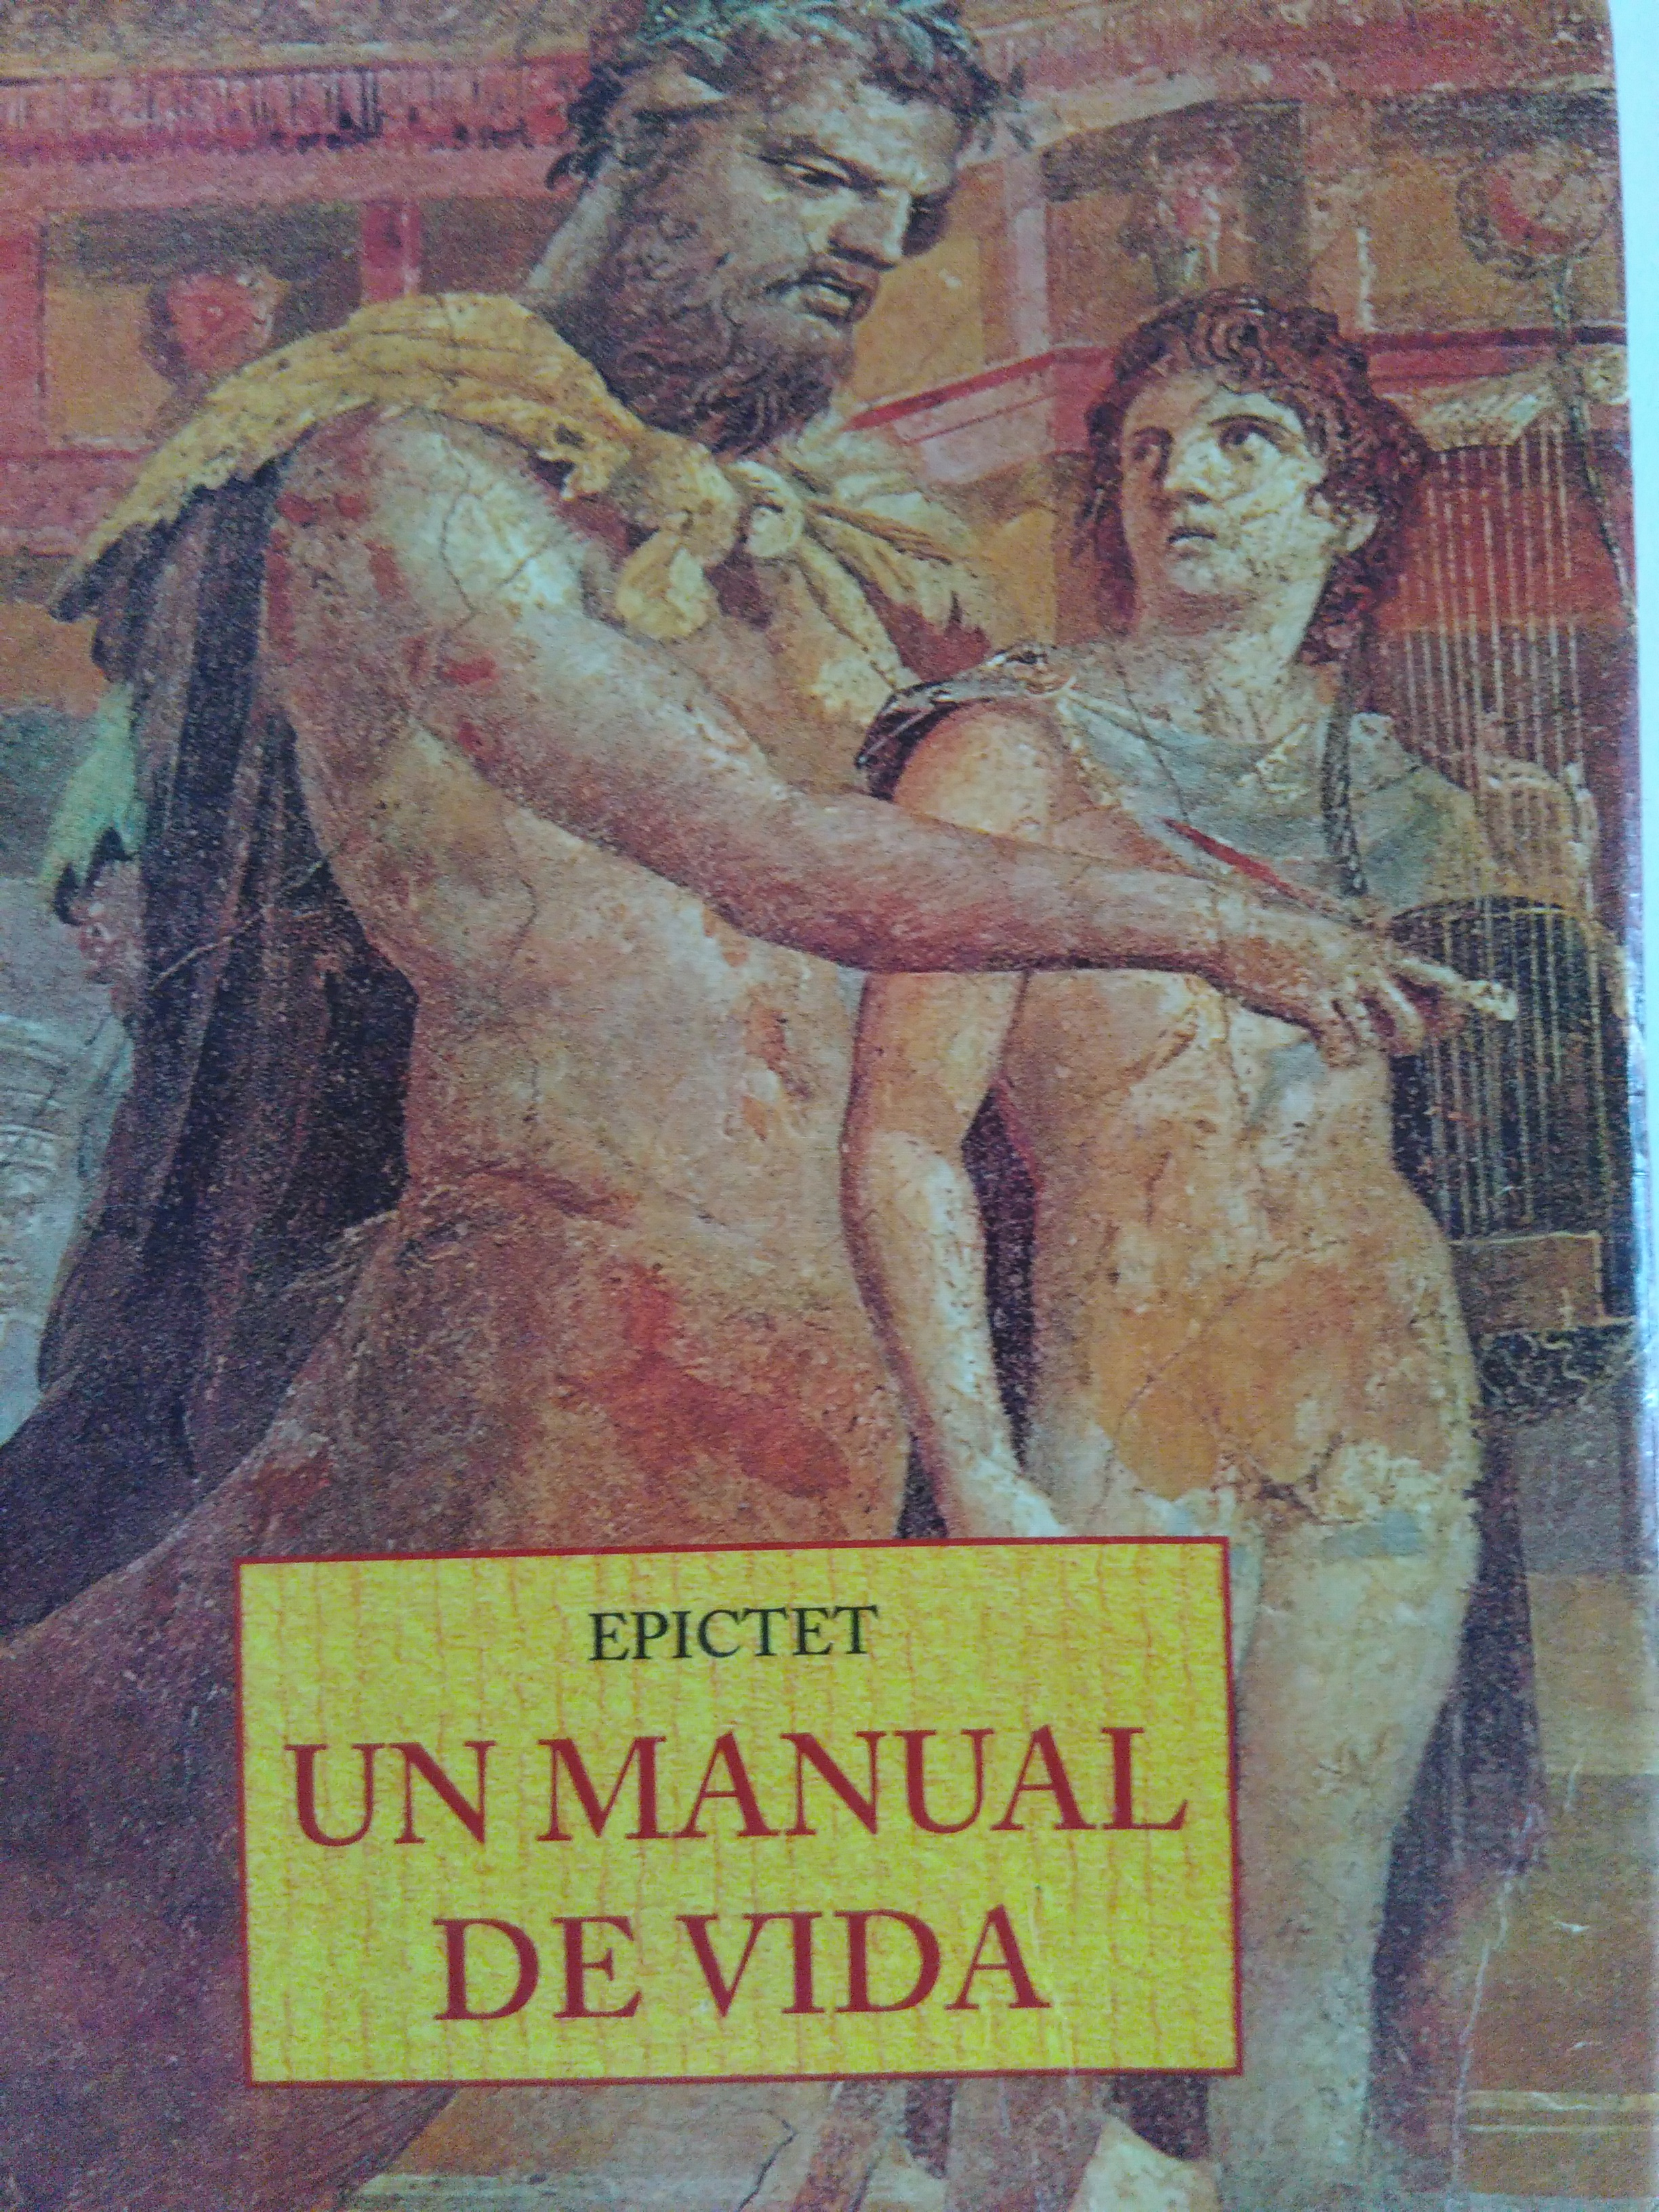 Epictet. Un manual de vida. Sharon Lebell. 1997